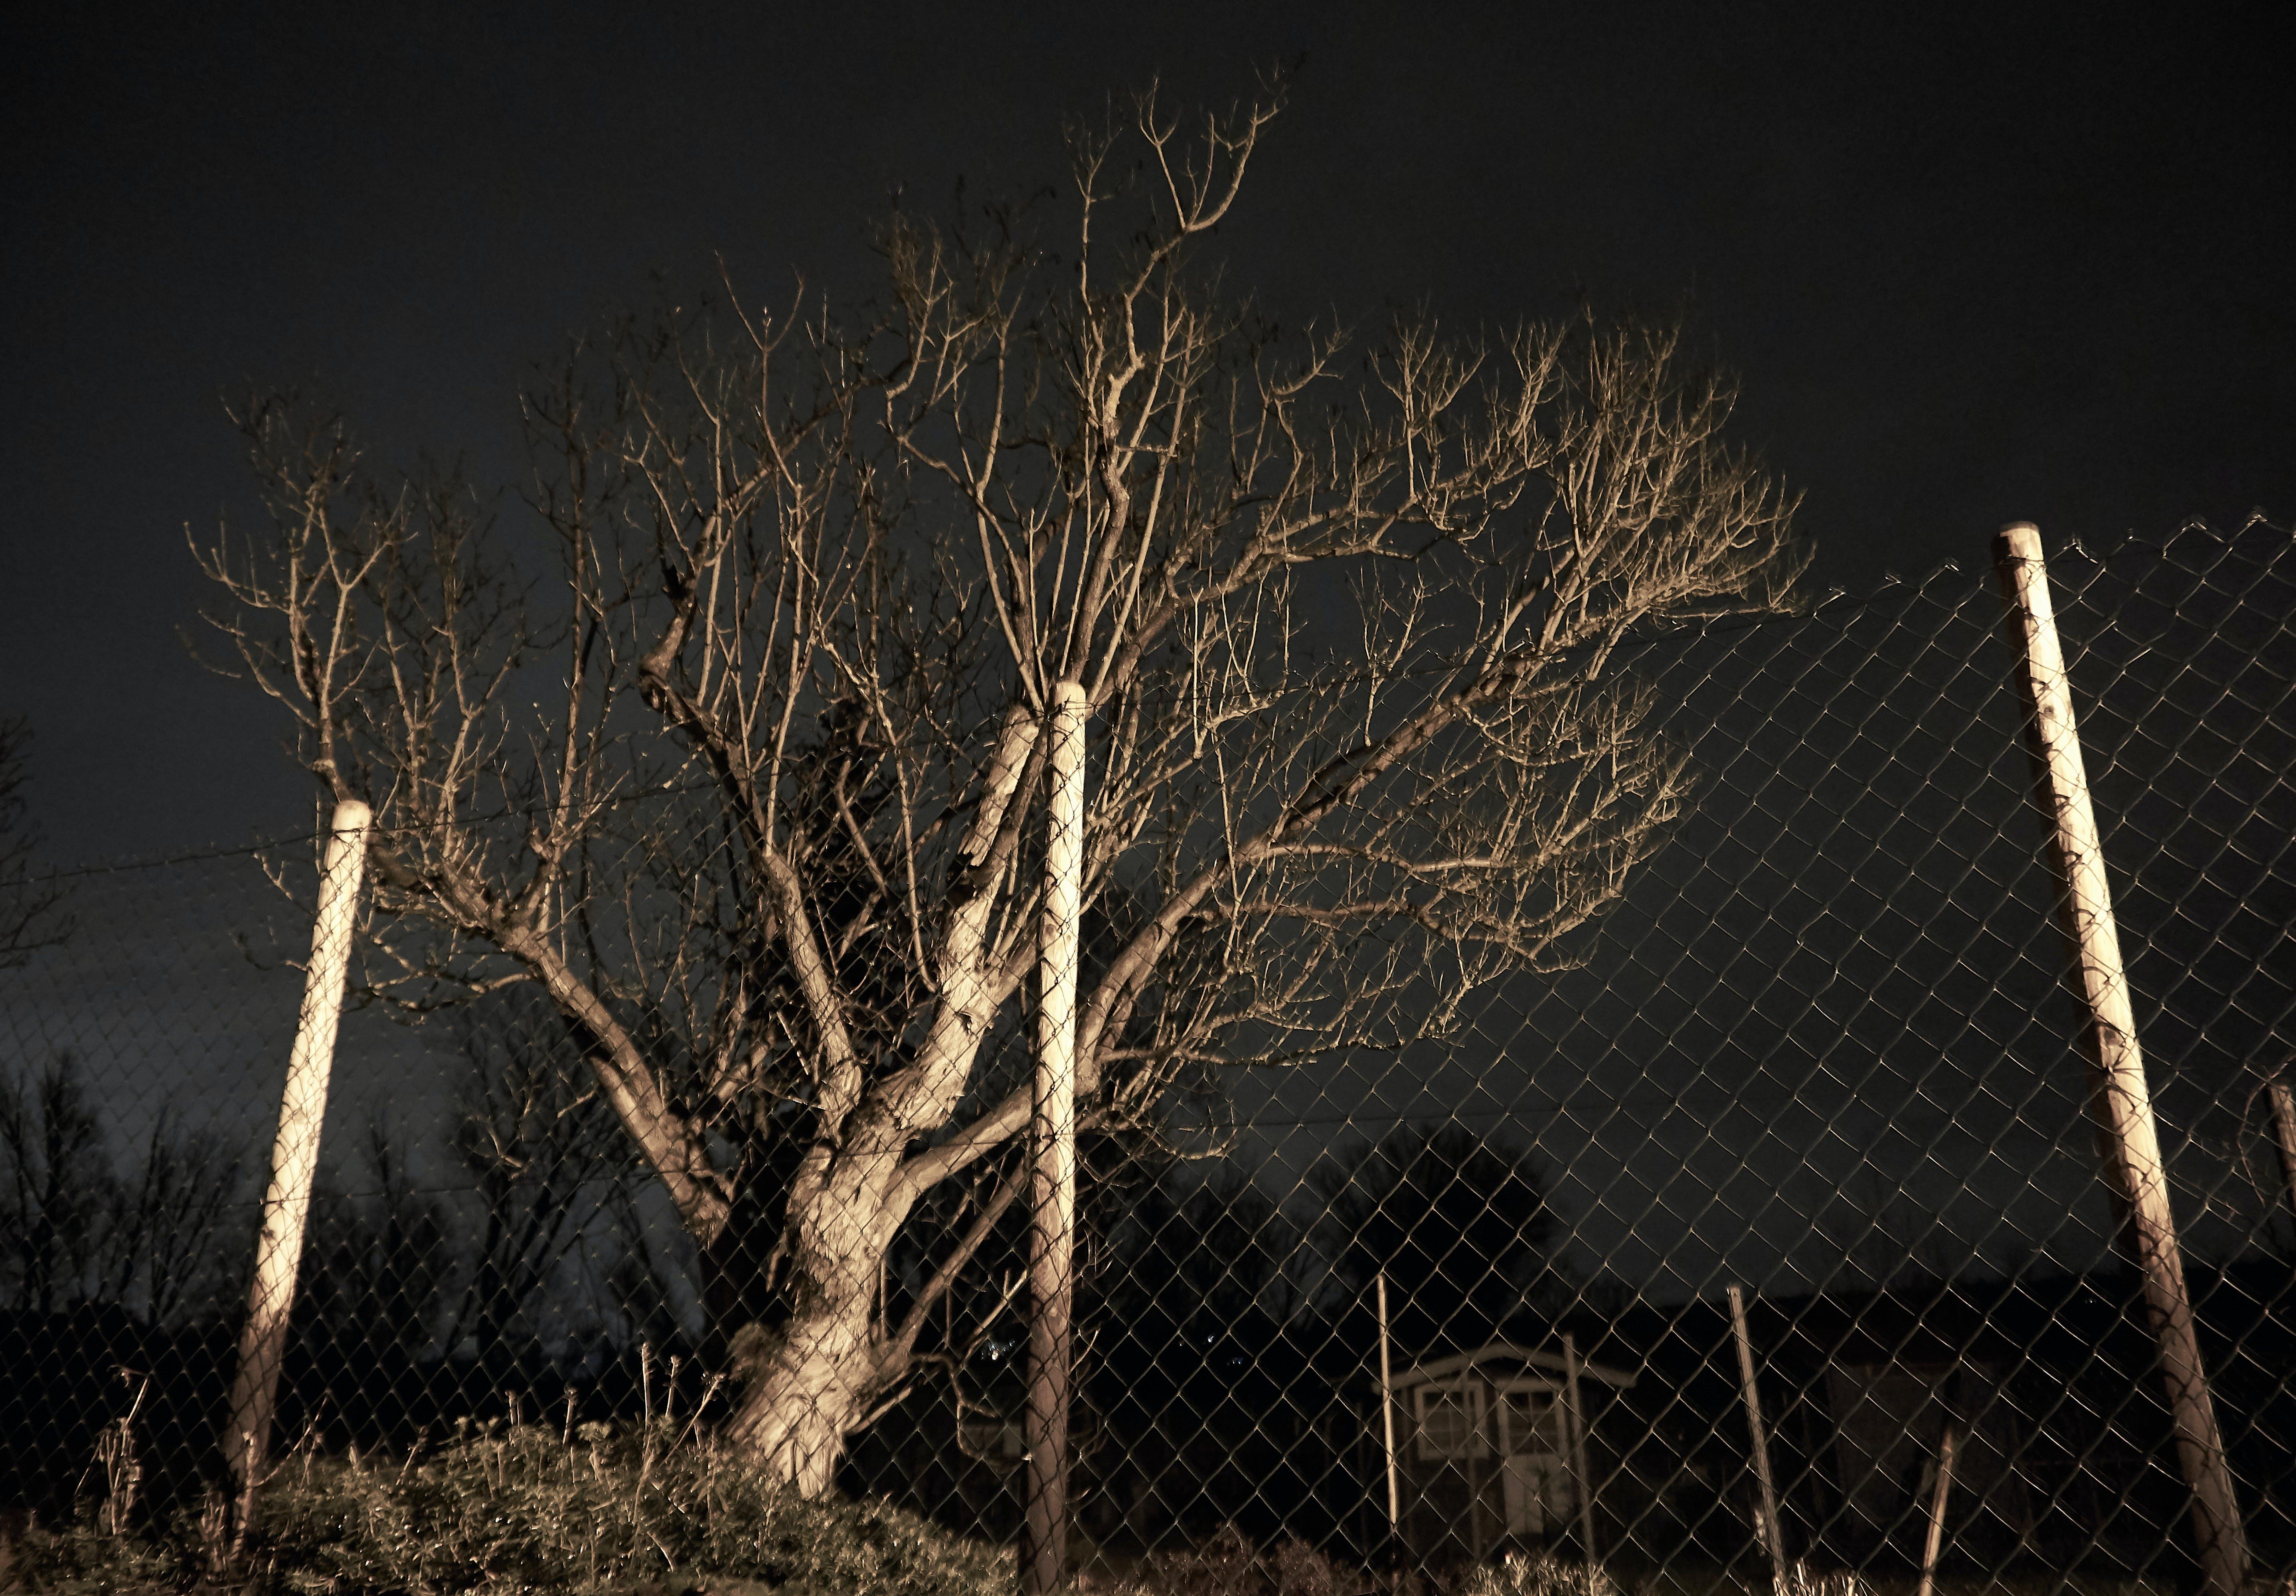 Free stock photo of exposure, night, tree, wood fence